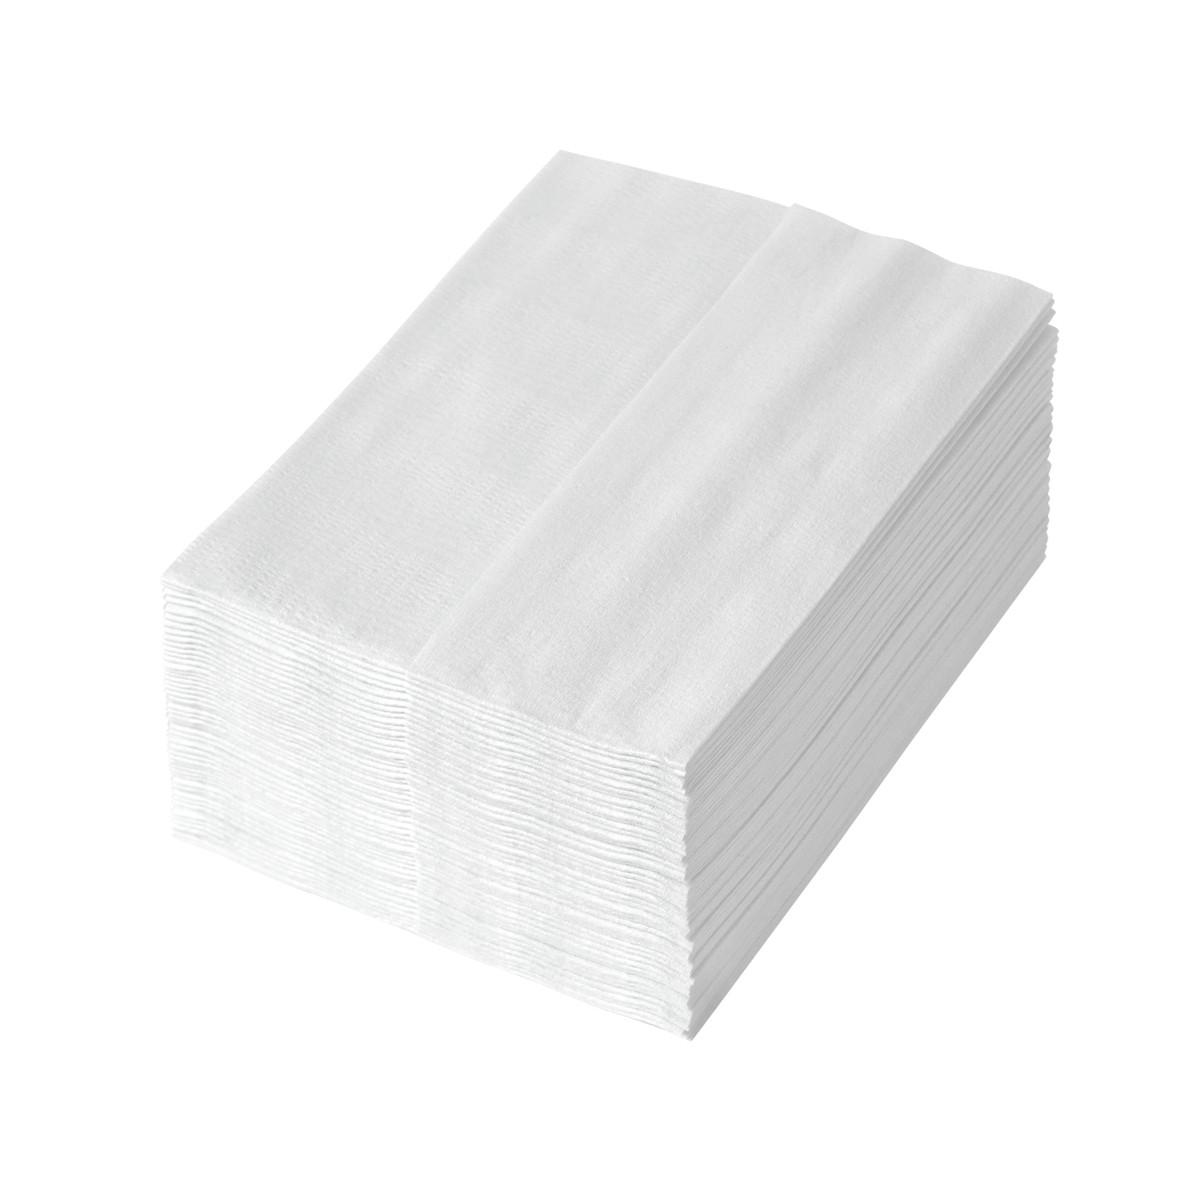 Салфетки протирочные TEMCA Profix Escon Power, 30х38см, 50 листов